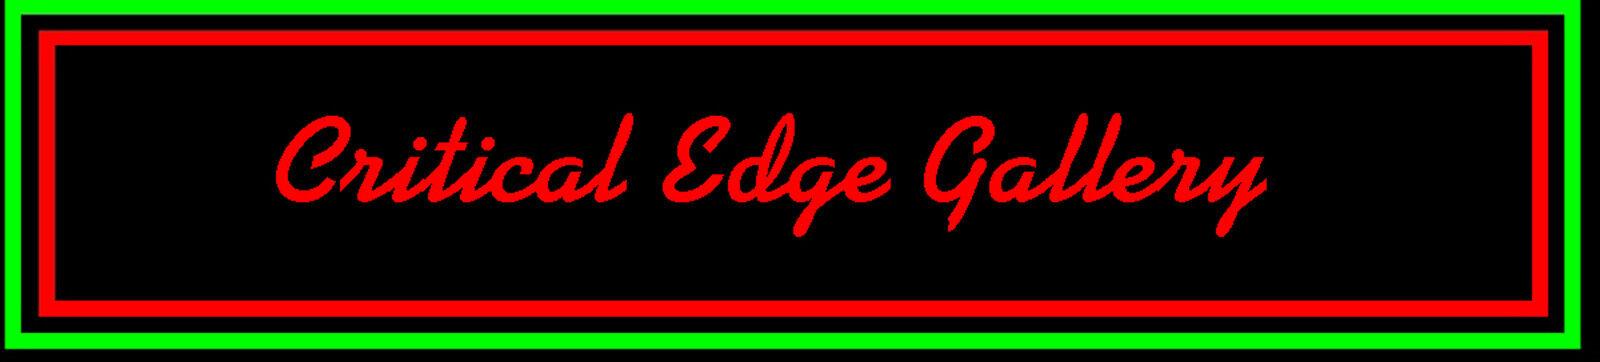 critical edge gallery